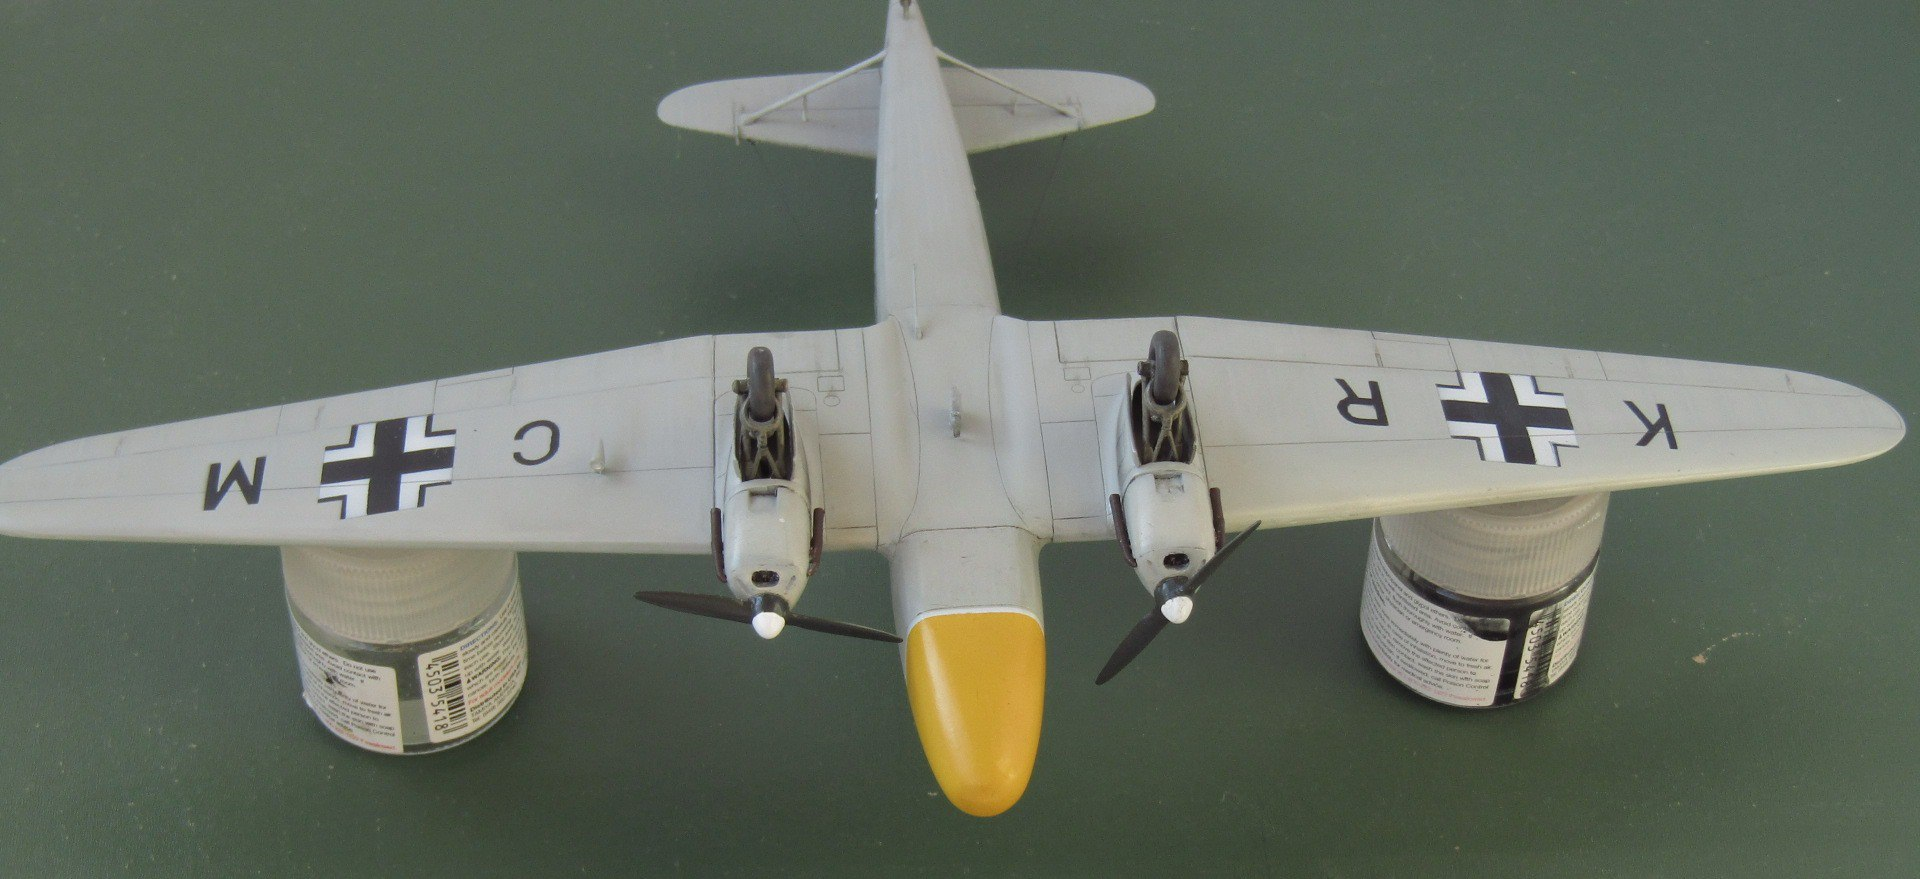 FW - 58C weihe 1/72 (Special Hobby) 25hV4BE4Da0